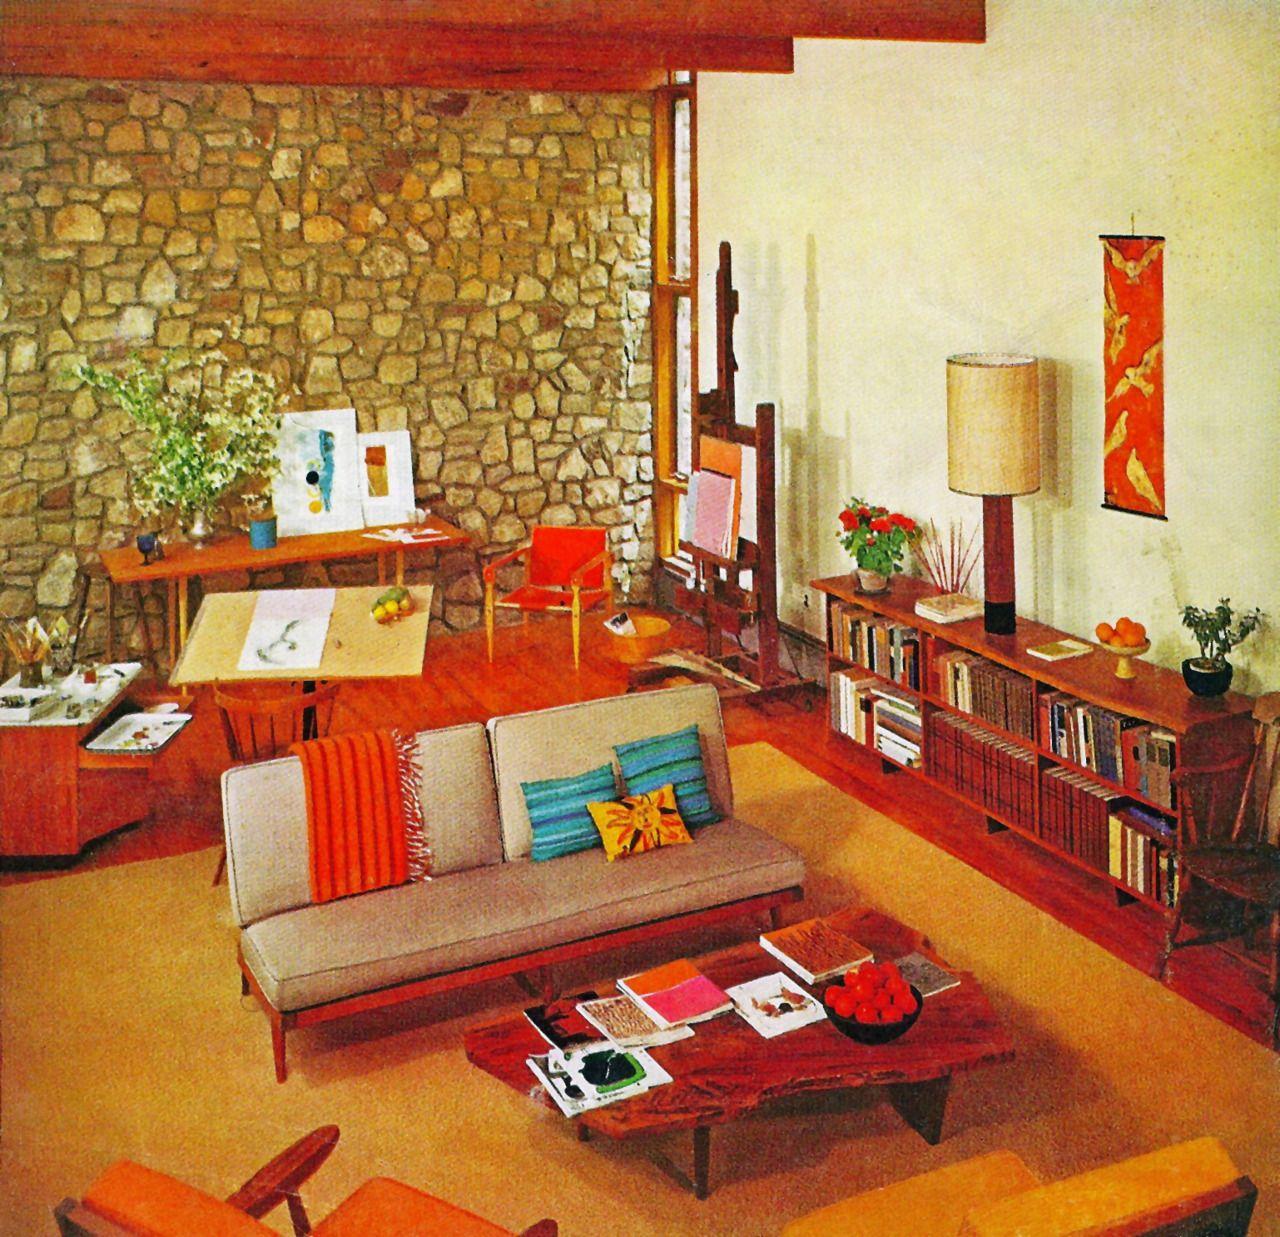 The Retro Decorator 1967 Living Room Retro Living Rooms Vintage Living Room Design Vintage Living Room 60s style living room